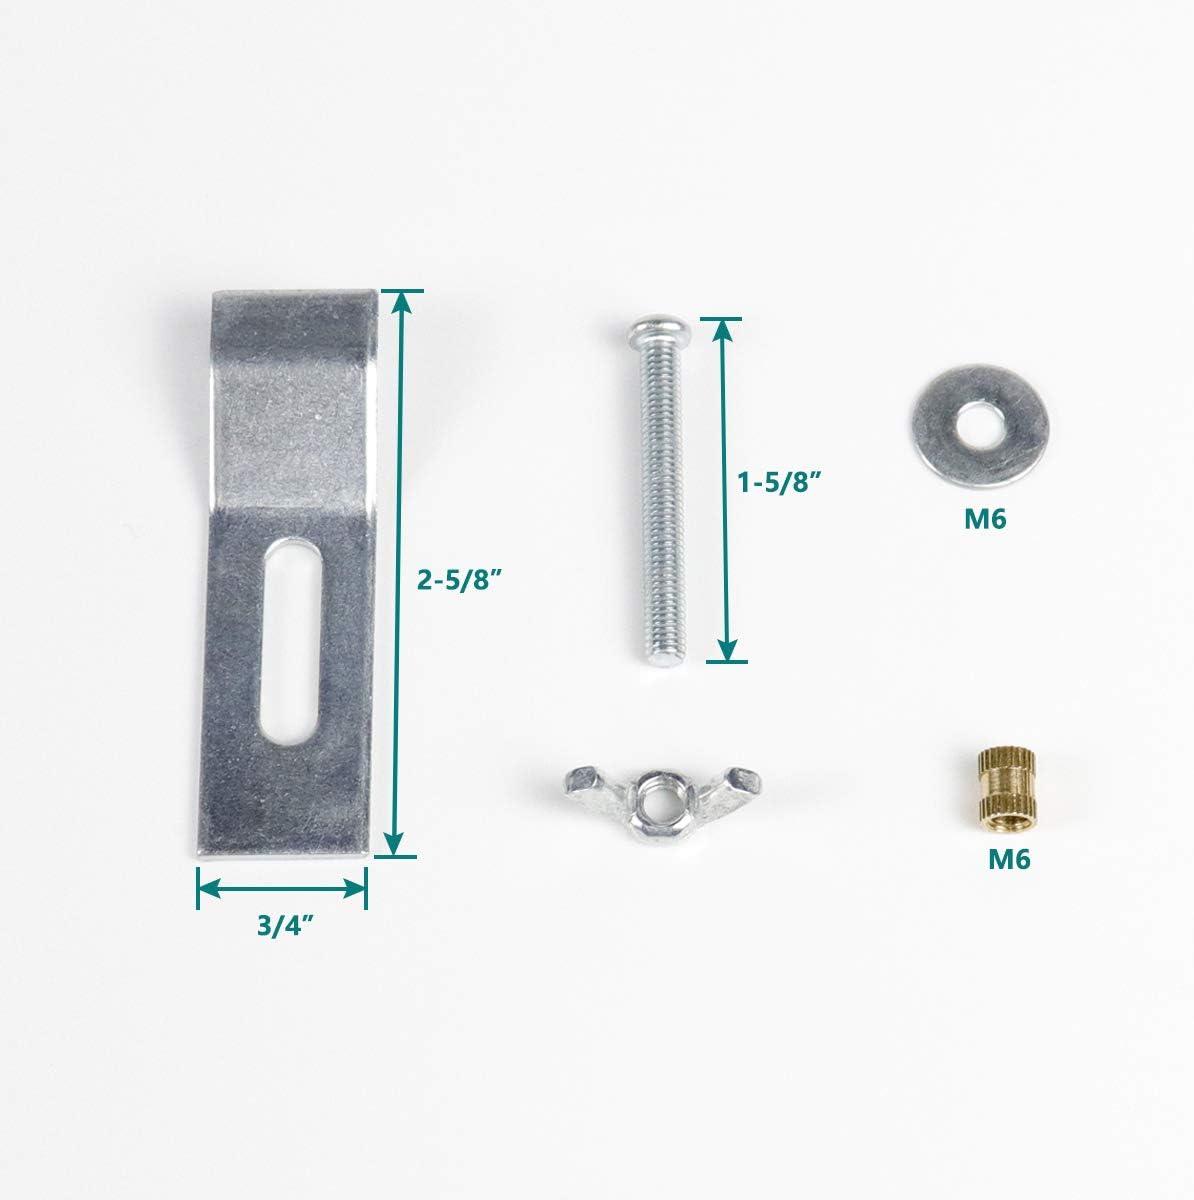 Buy Daisypower Undermount Sink Clips Sink Brackets Kitchen And Bathroom Sink Supports Kits 10 Pack Online In Vietnam B08dcy9m3g